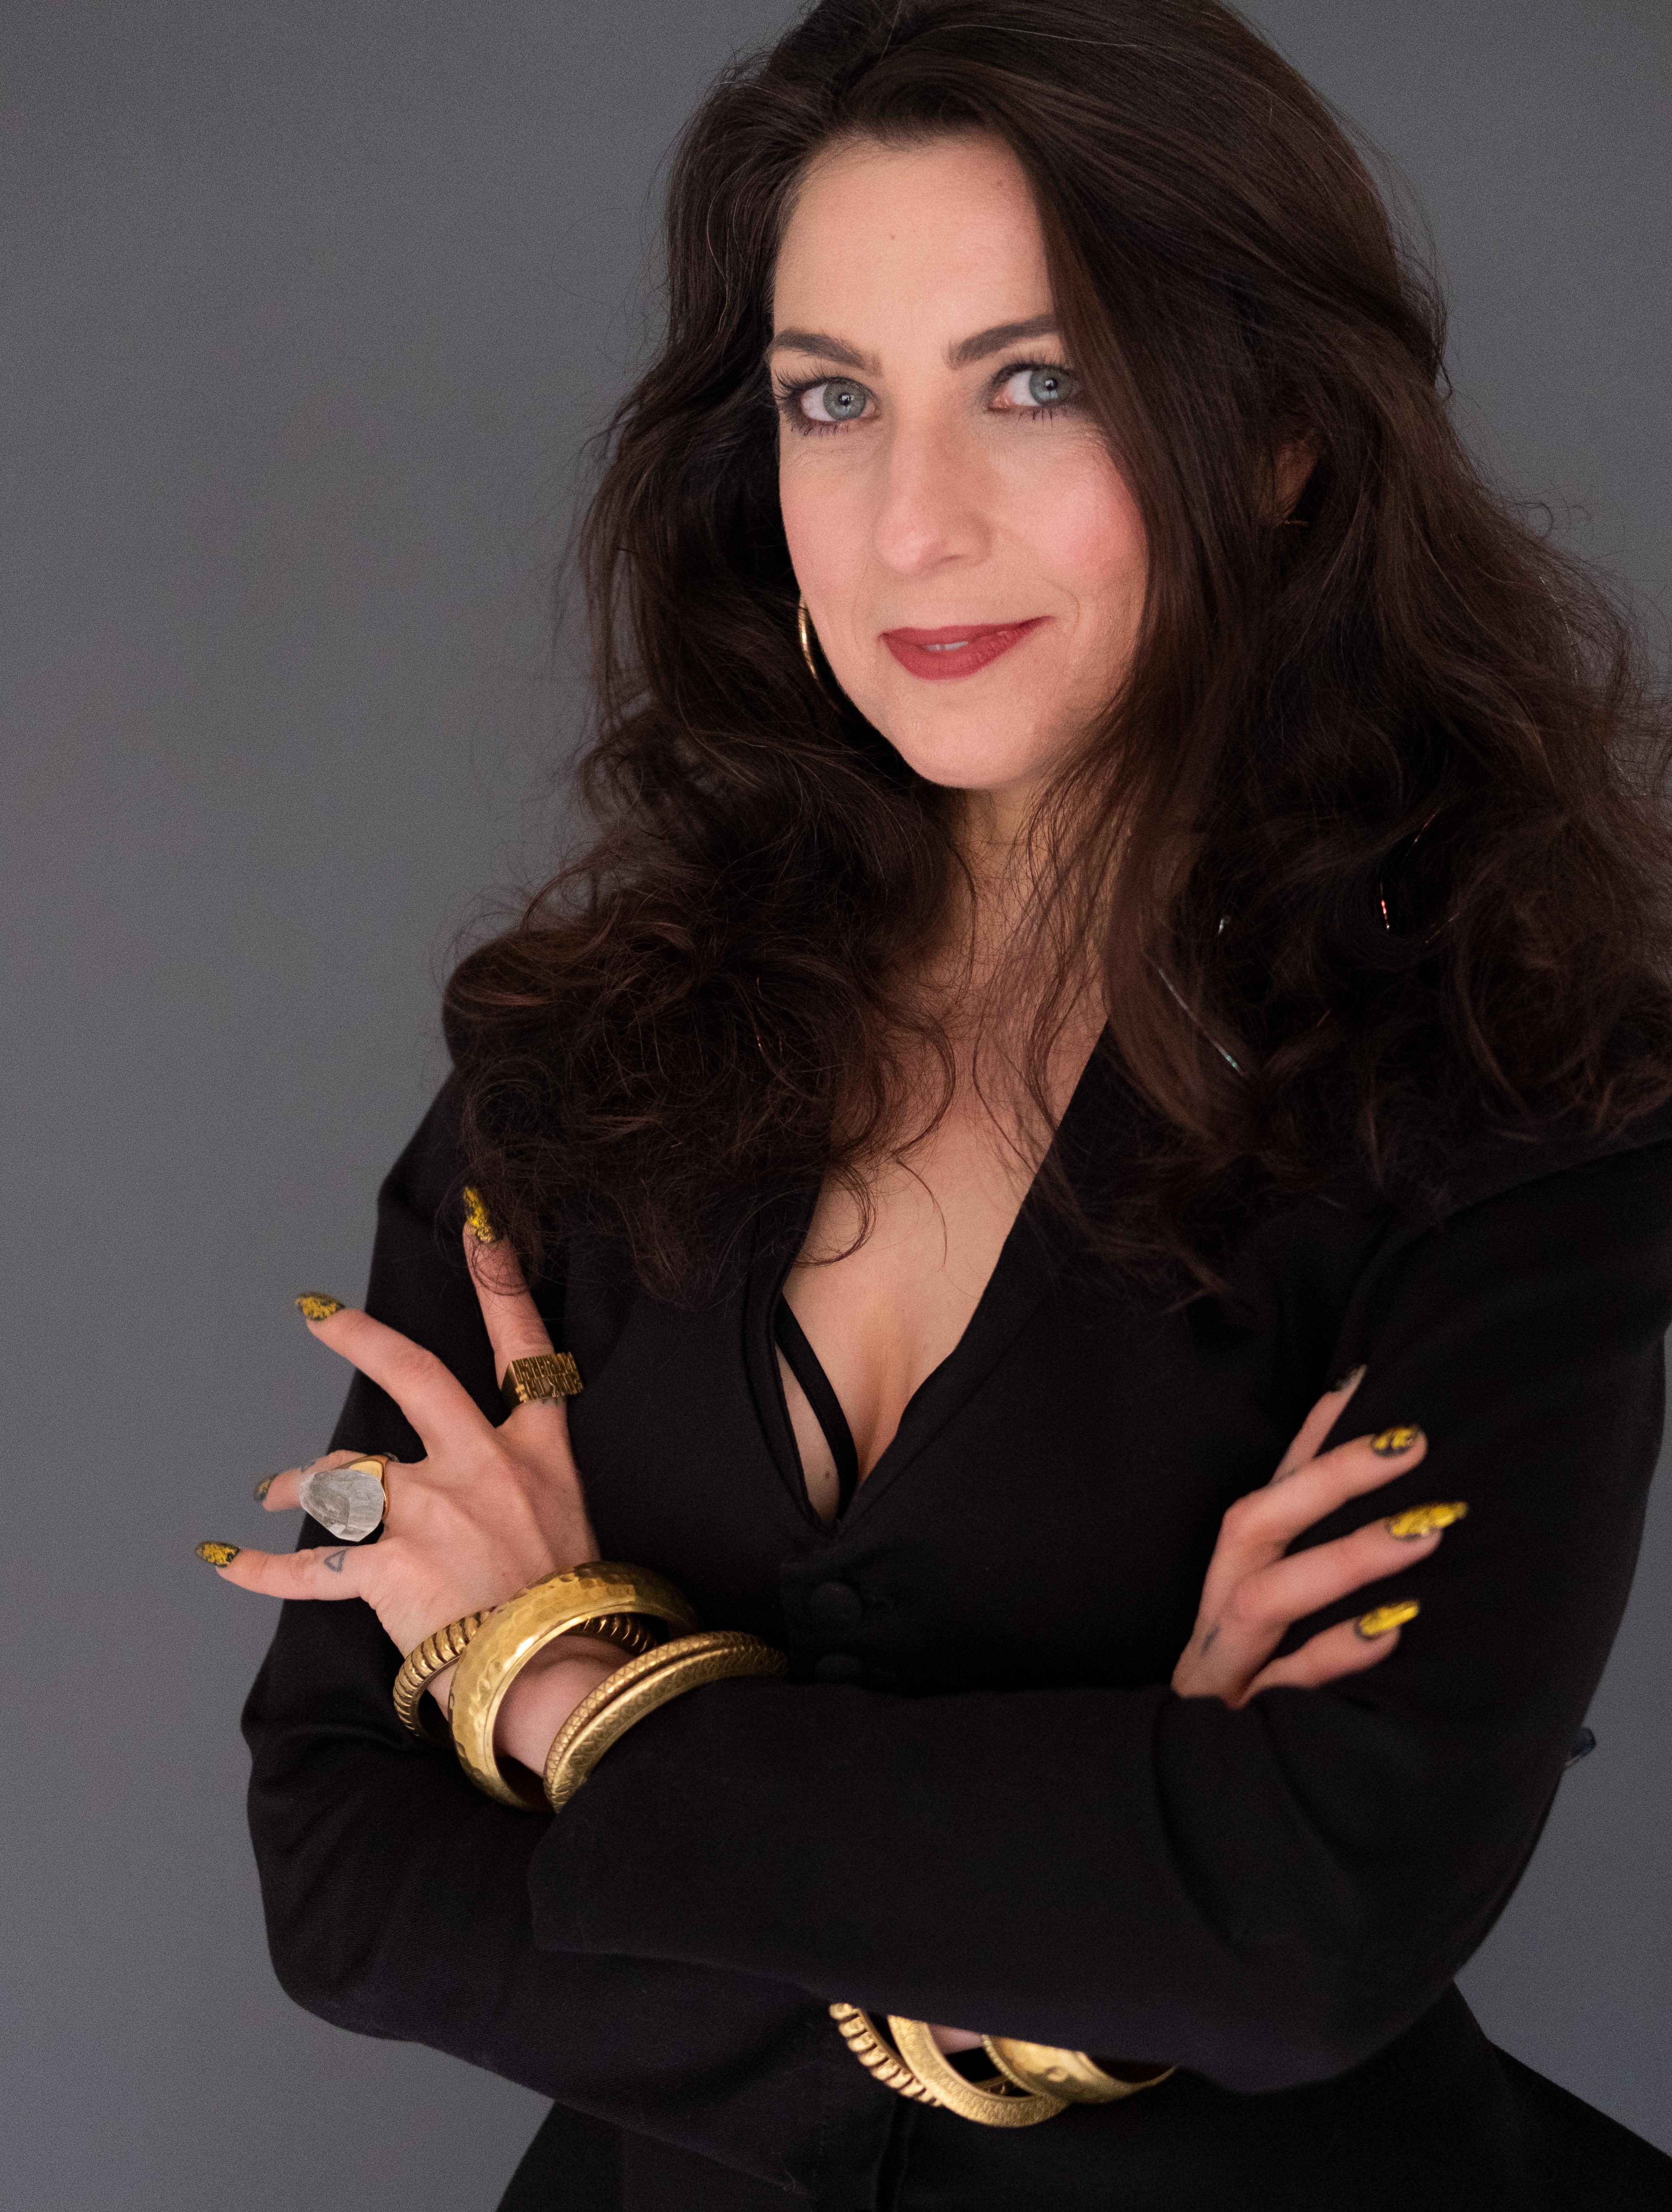 Dr Kate Tomas